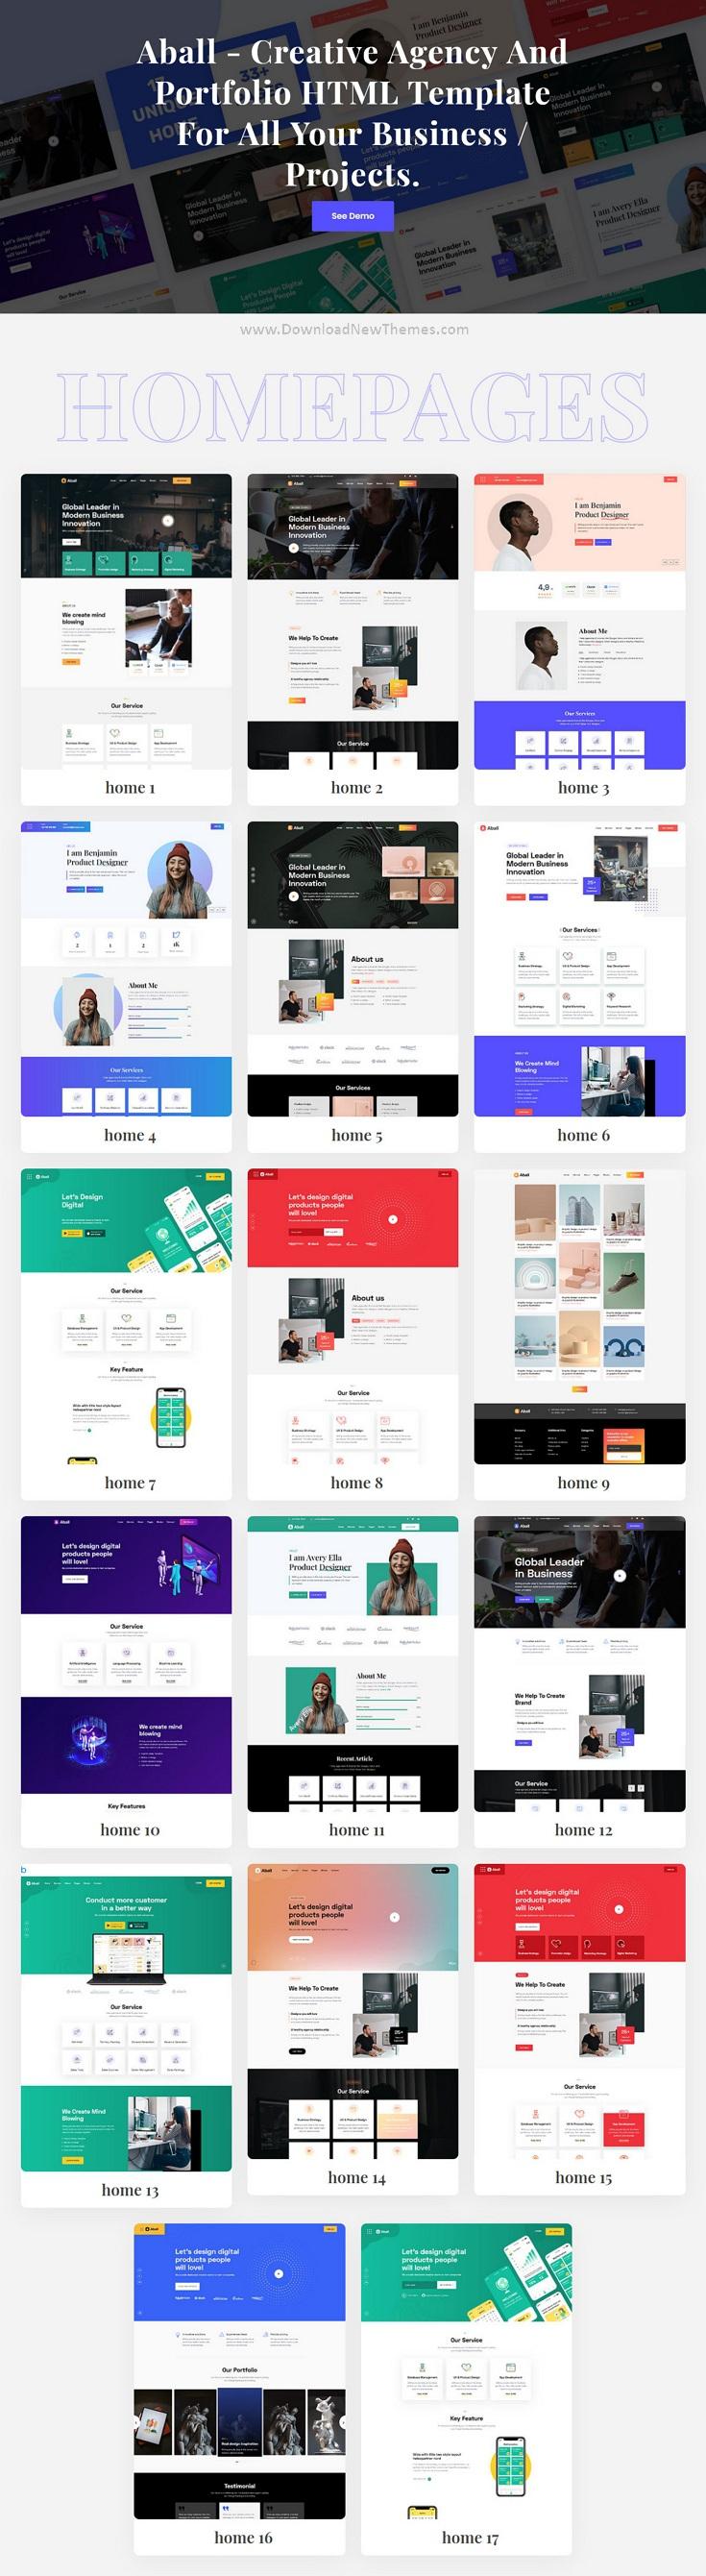 Agency and Portfolio Template